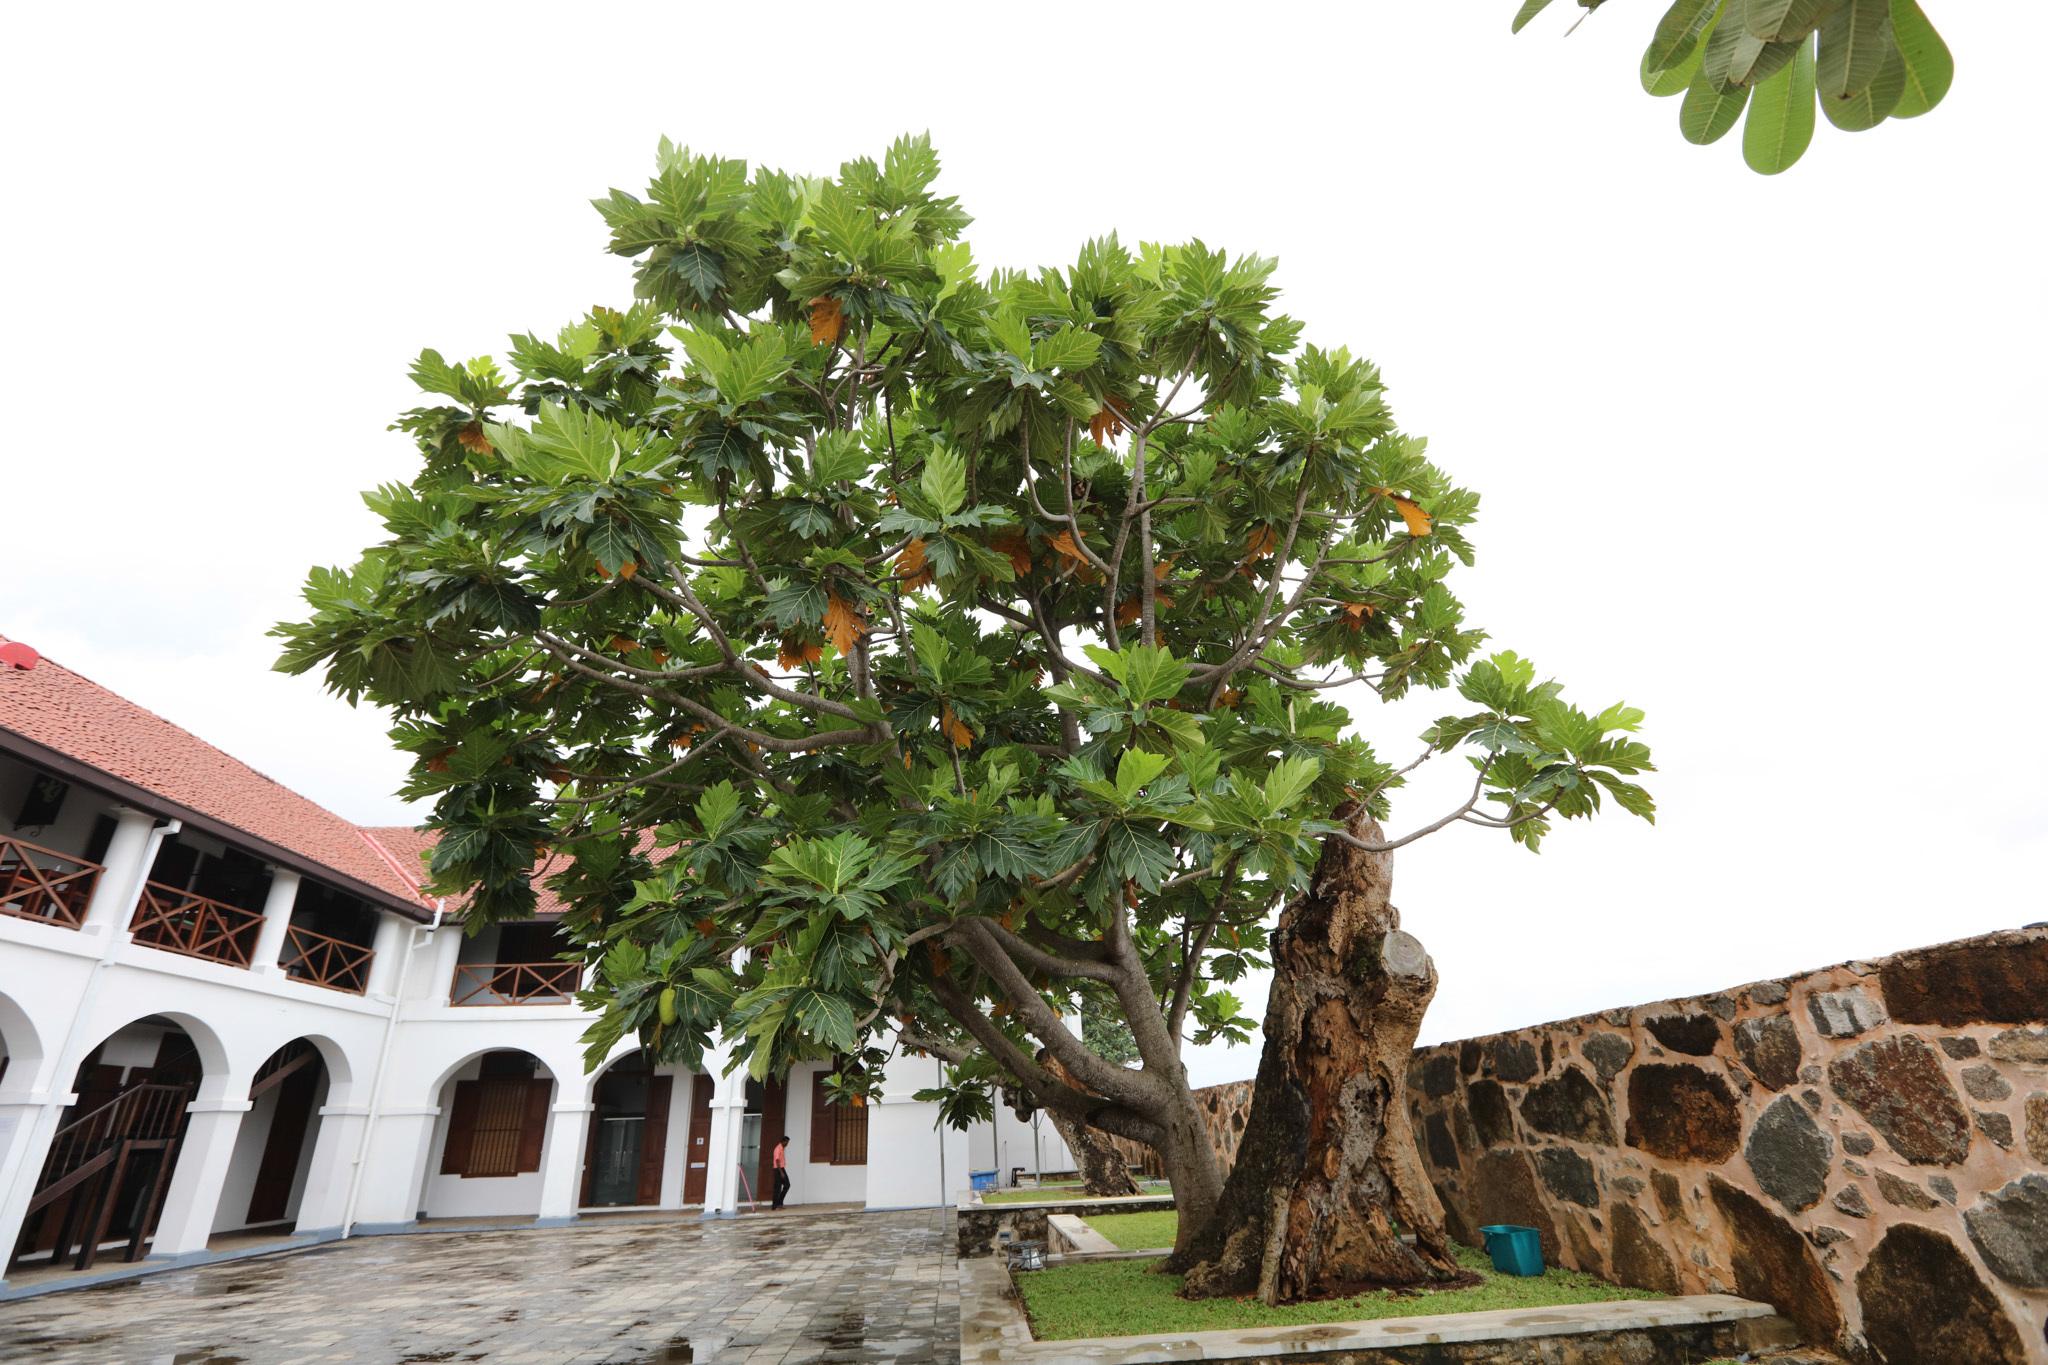 Find the breadfruit tree